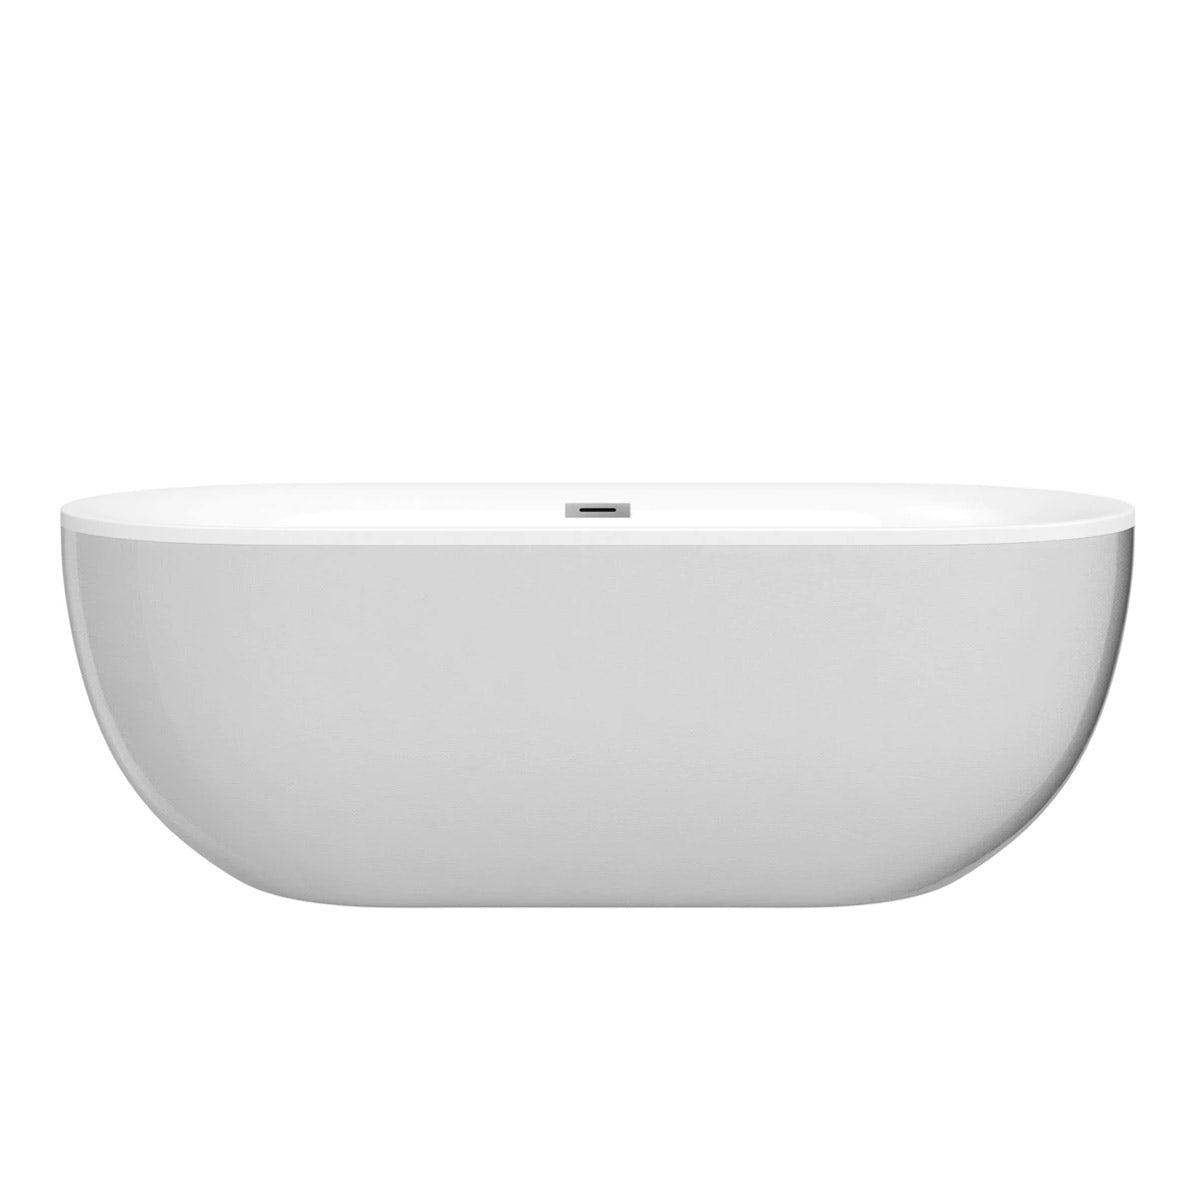 Mode Ellis pearl coloured freestanding bath